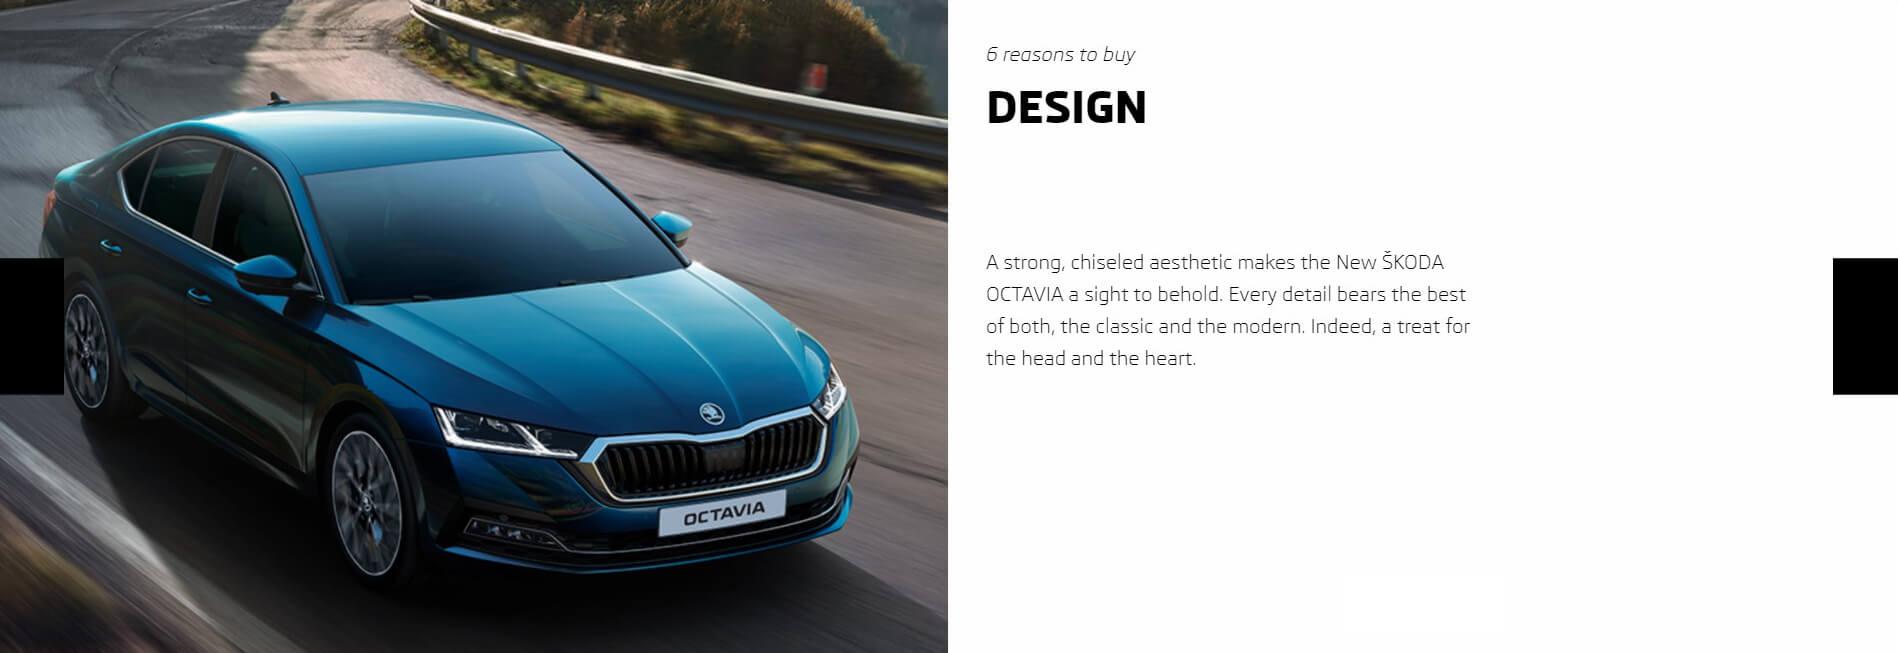 Design of New Octavia 2021